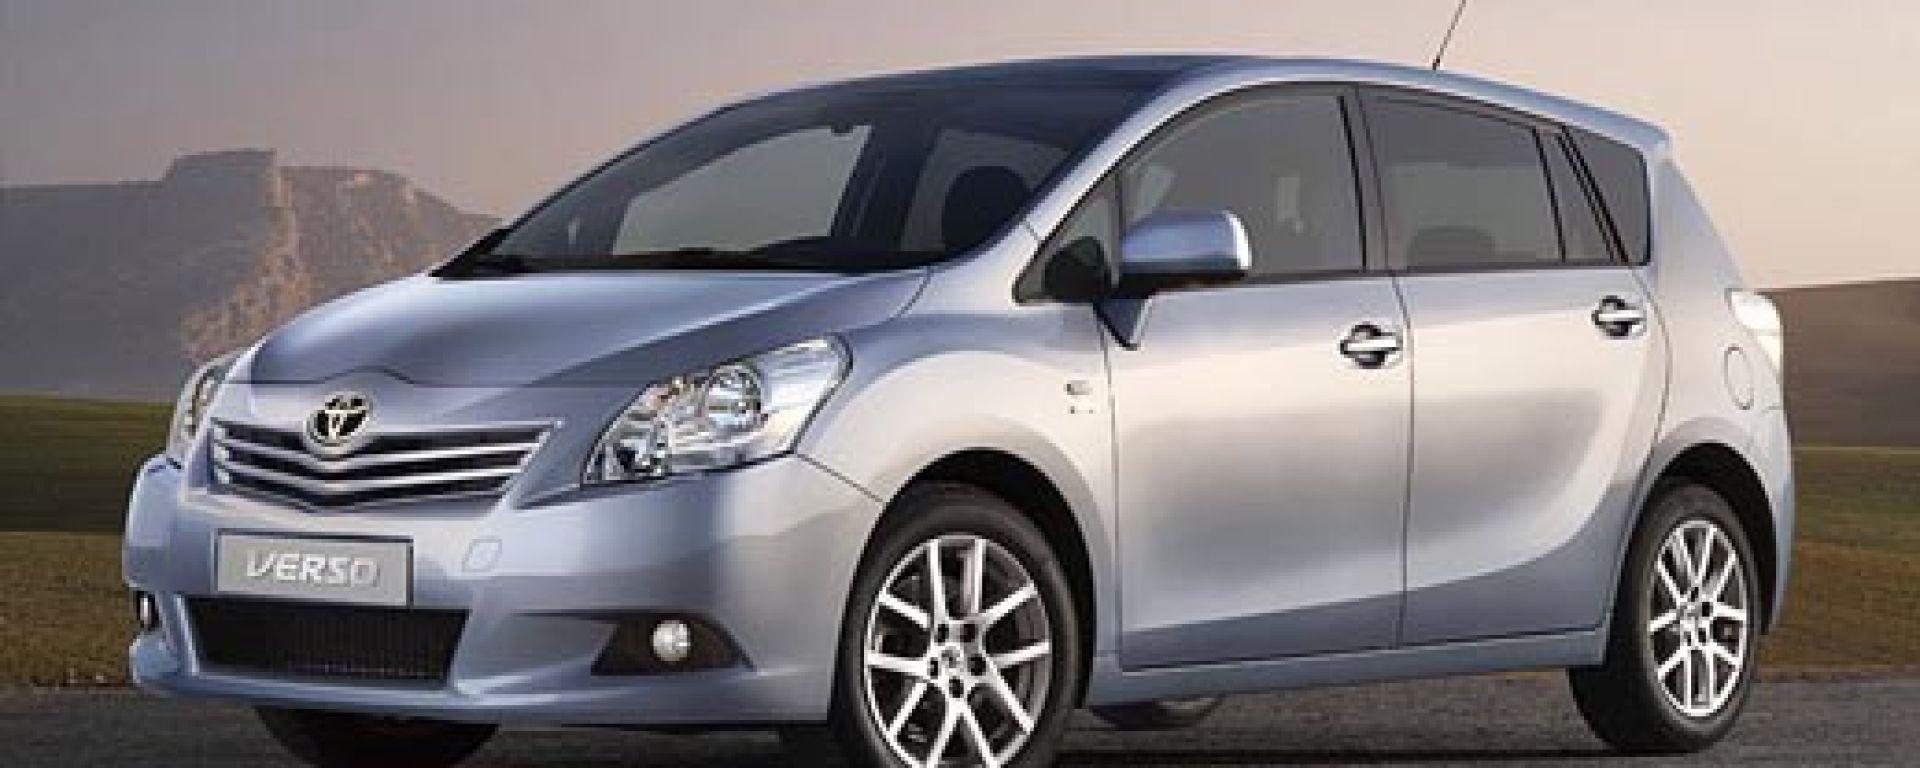 Toyota Verso 2010